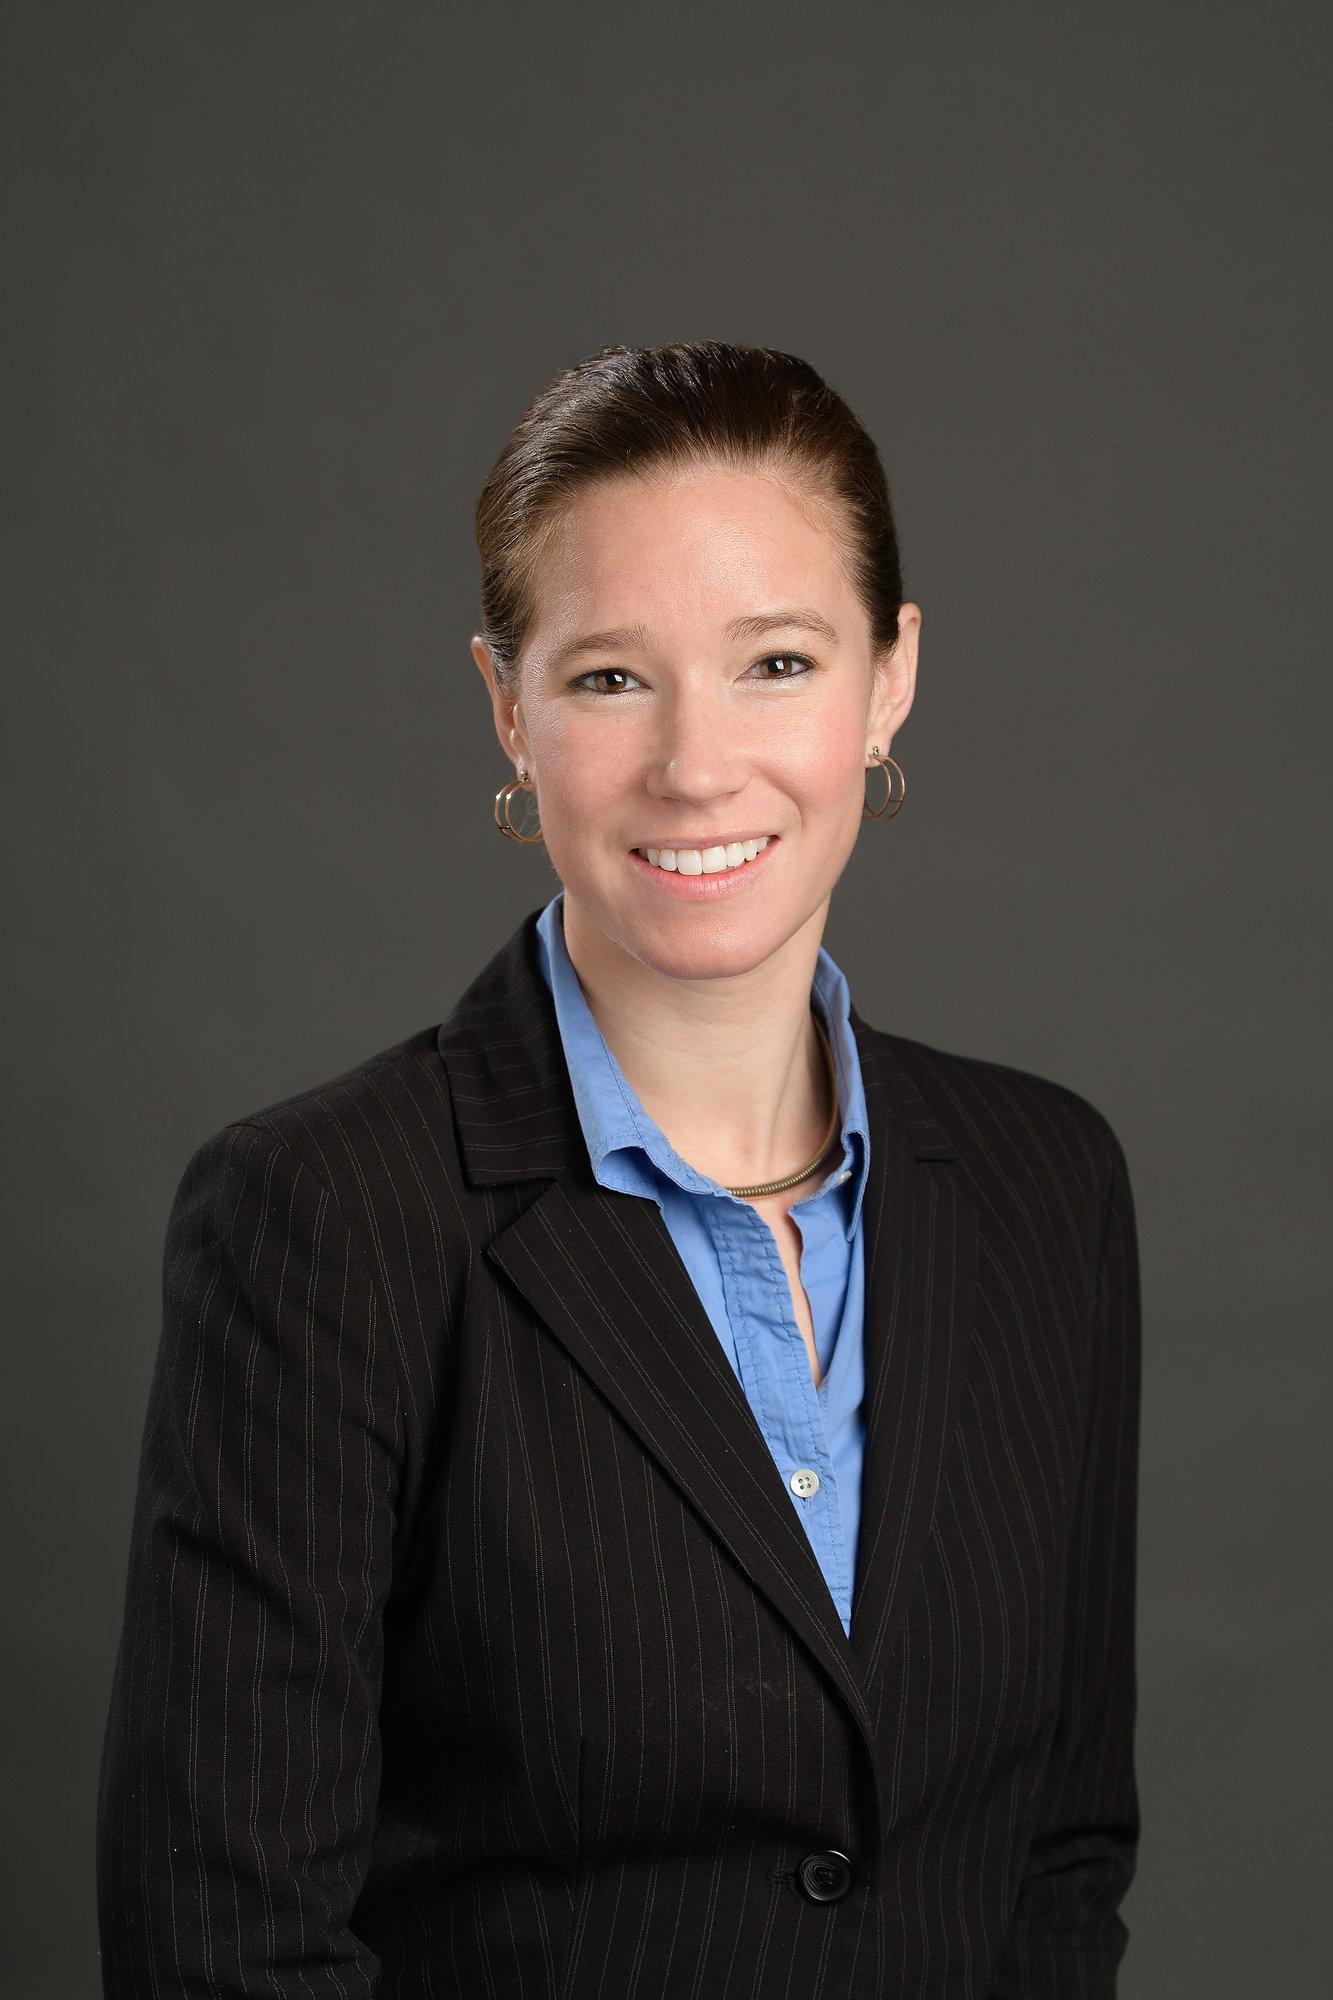 Katie Keally